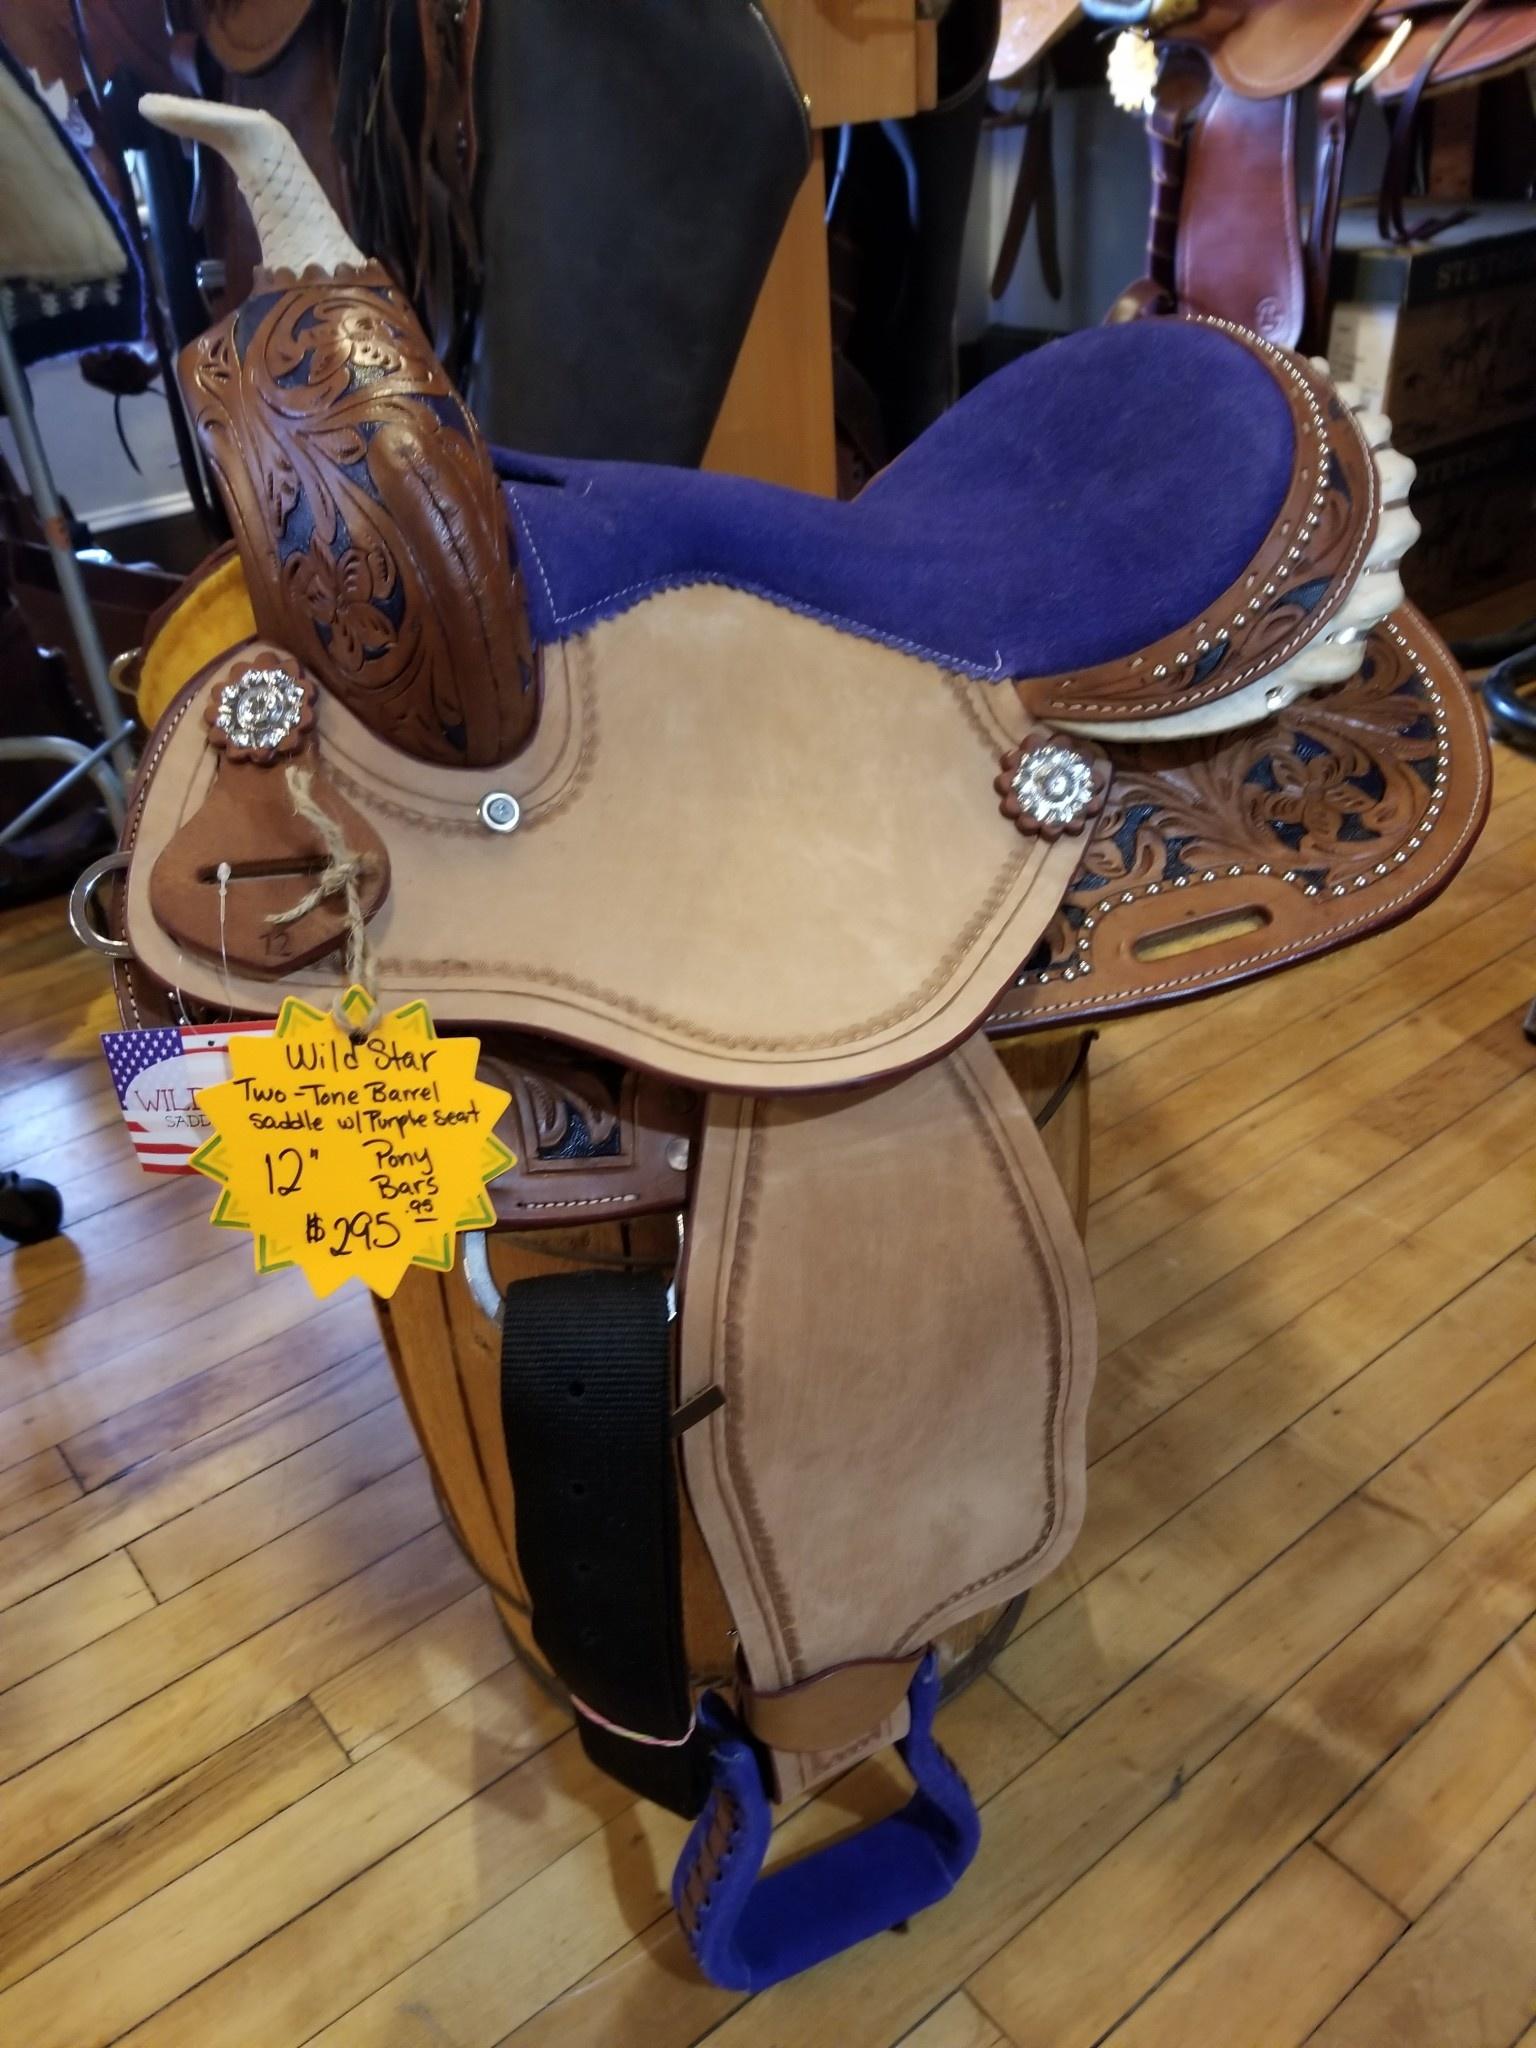 "12"" PONY BAR Wild Star Two-Tone Barrel Saddle (Purple)"